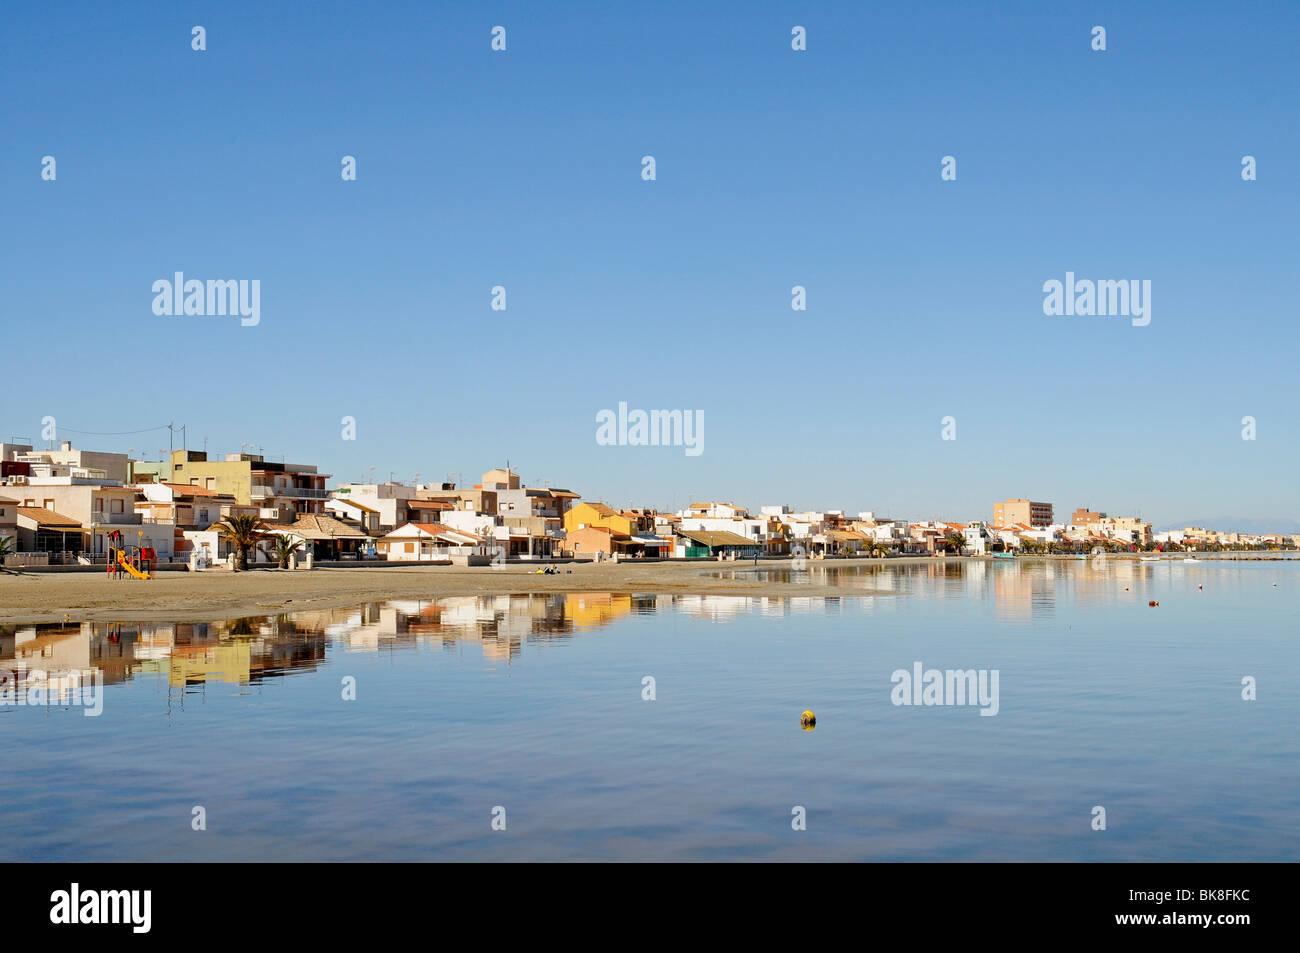 Los Nietos, houses, village, lagoon, inland sea, Mar Menor, Murcia, Spain, Europe - Stock Image